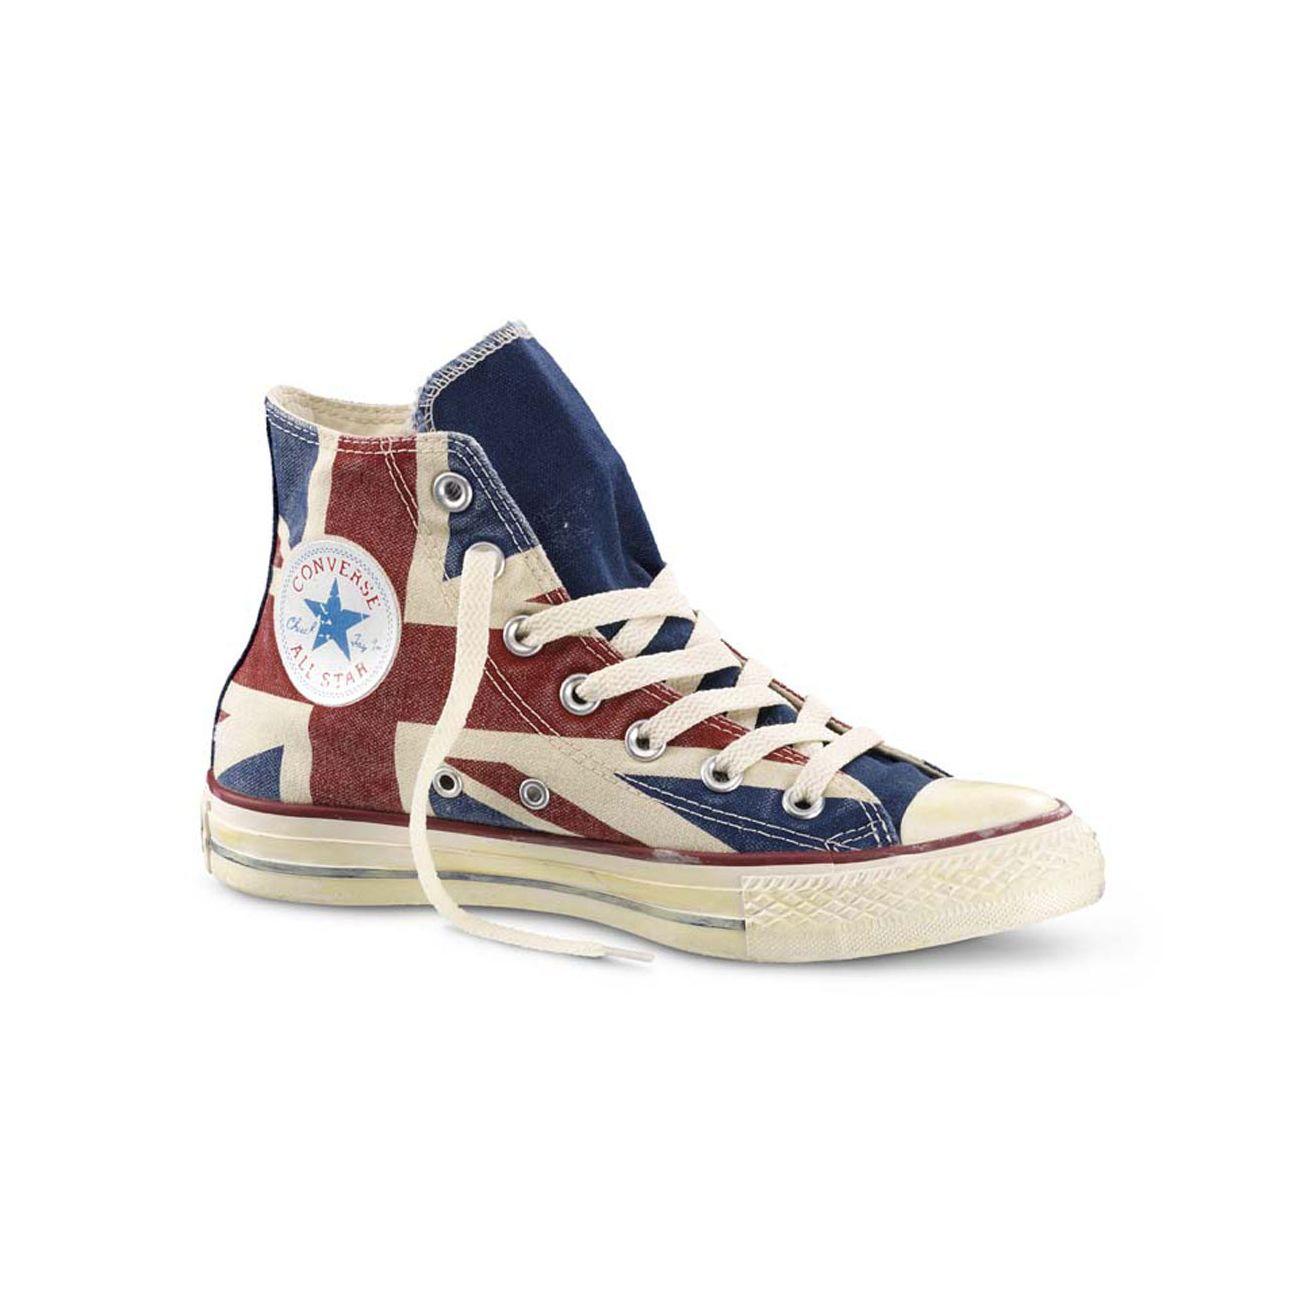 CONVERSE ALL STAR HI GRAPHICS UK FLAG   Mascheroni Sportswear